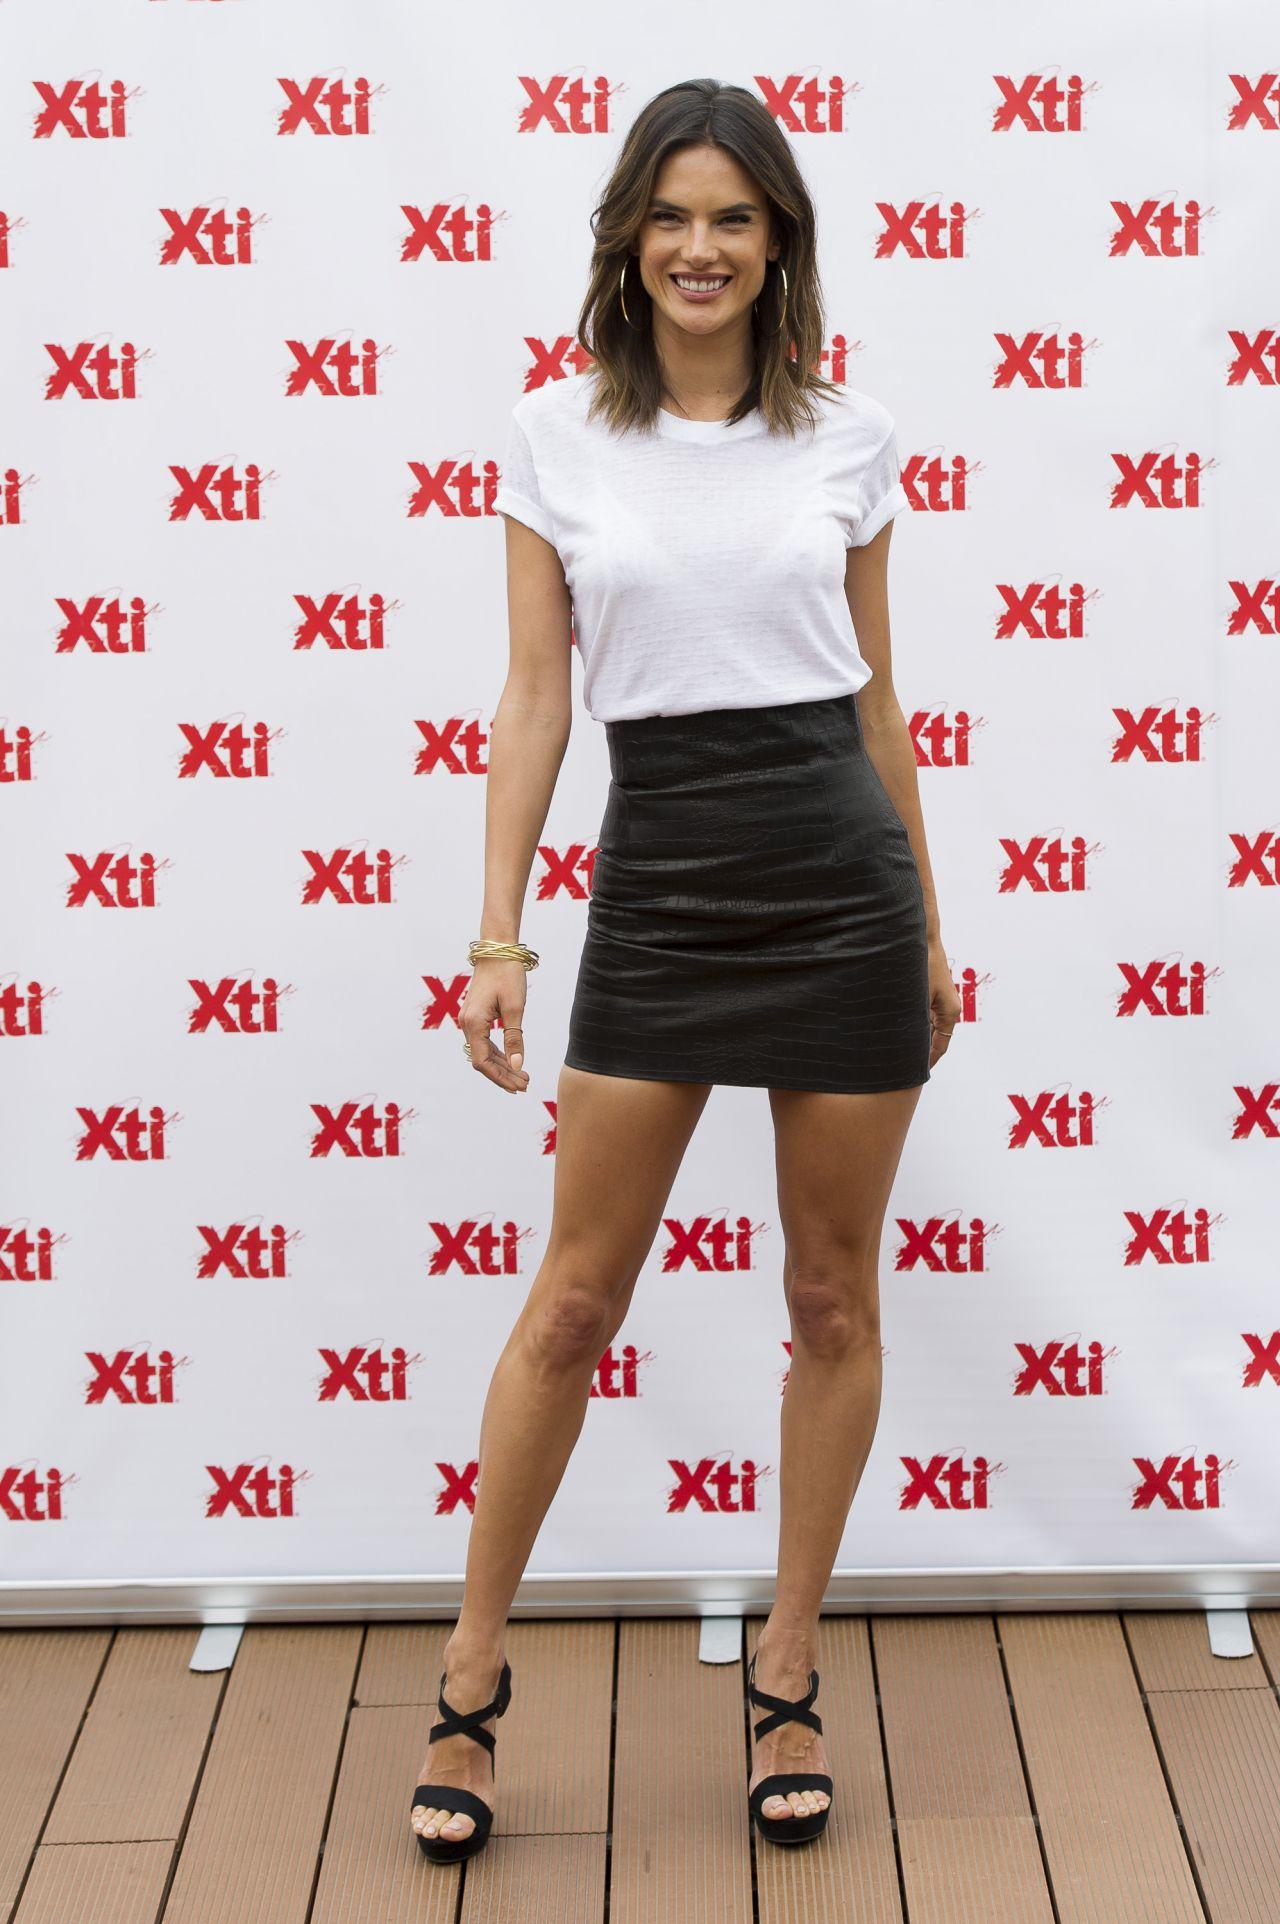 Alessandra Ambrosio Wearing a Miniskirt - Presents 'Xti' New ...